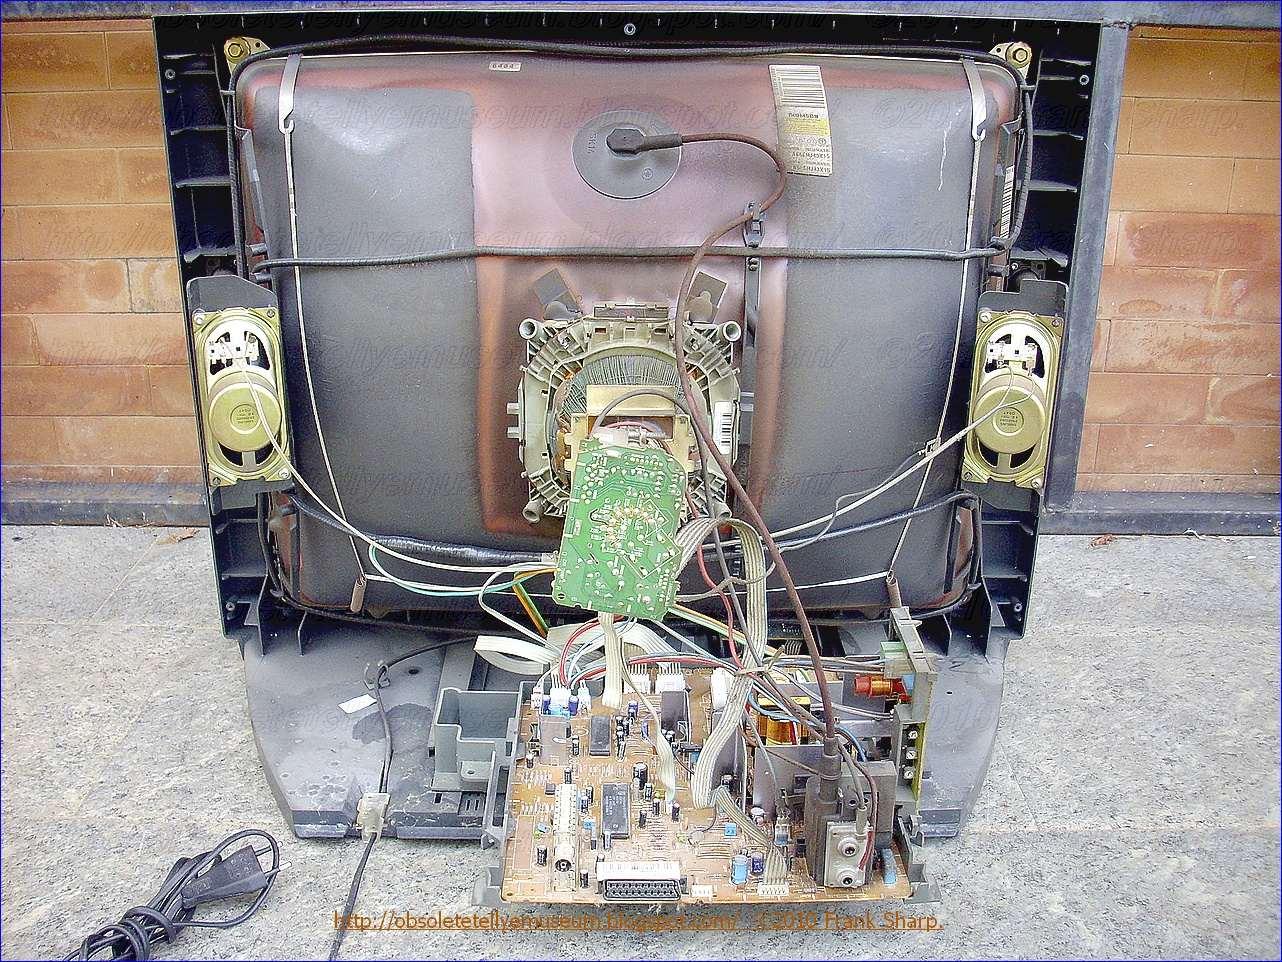 hight resolution of  wiring diagram on spa obsolete technology tellye thomson 28dg17e blackpearl 413 on spa motor